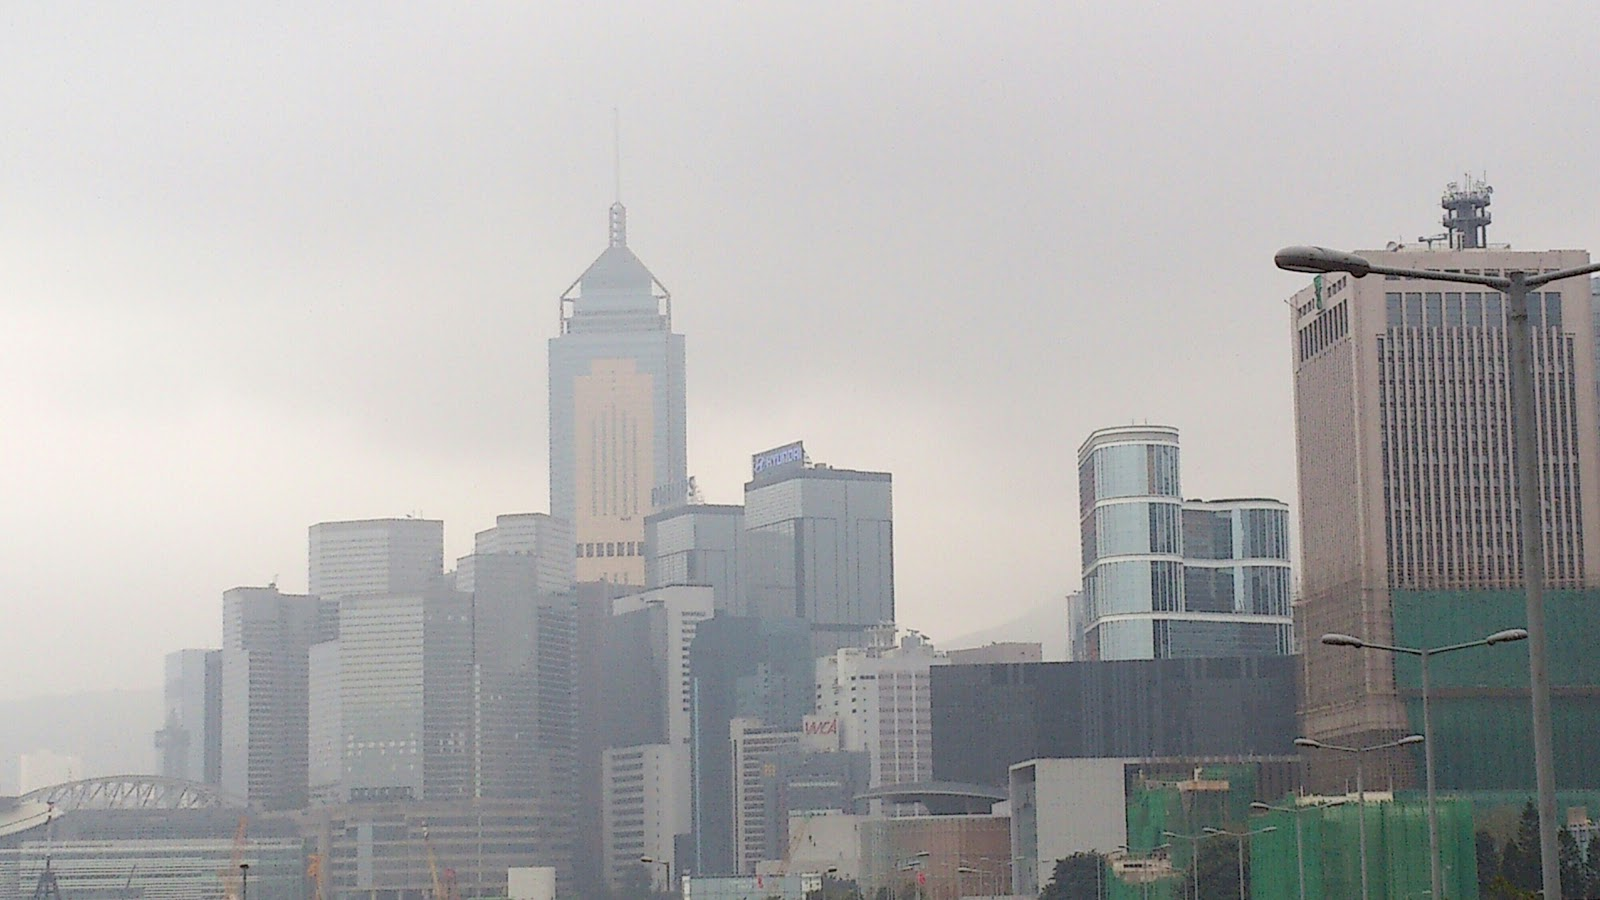 Hong KOng Skyscrapers view